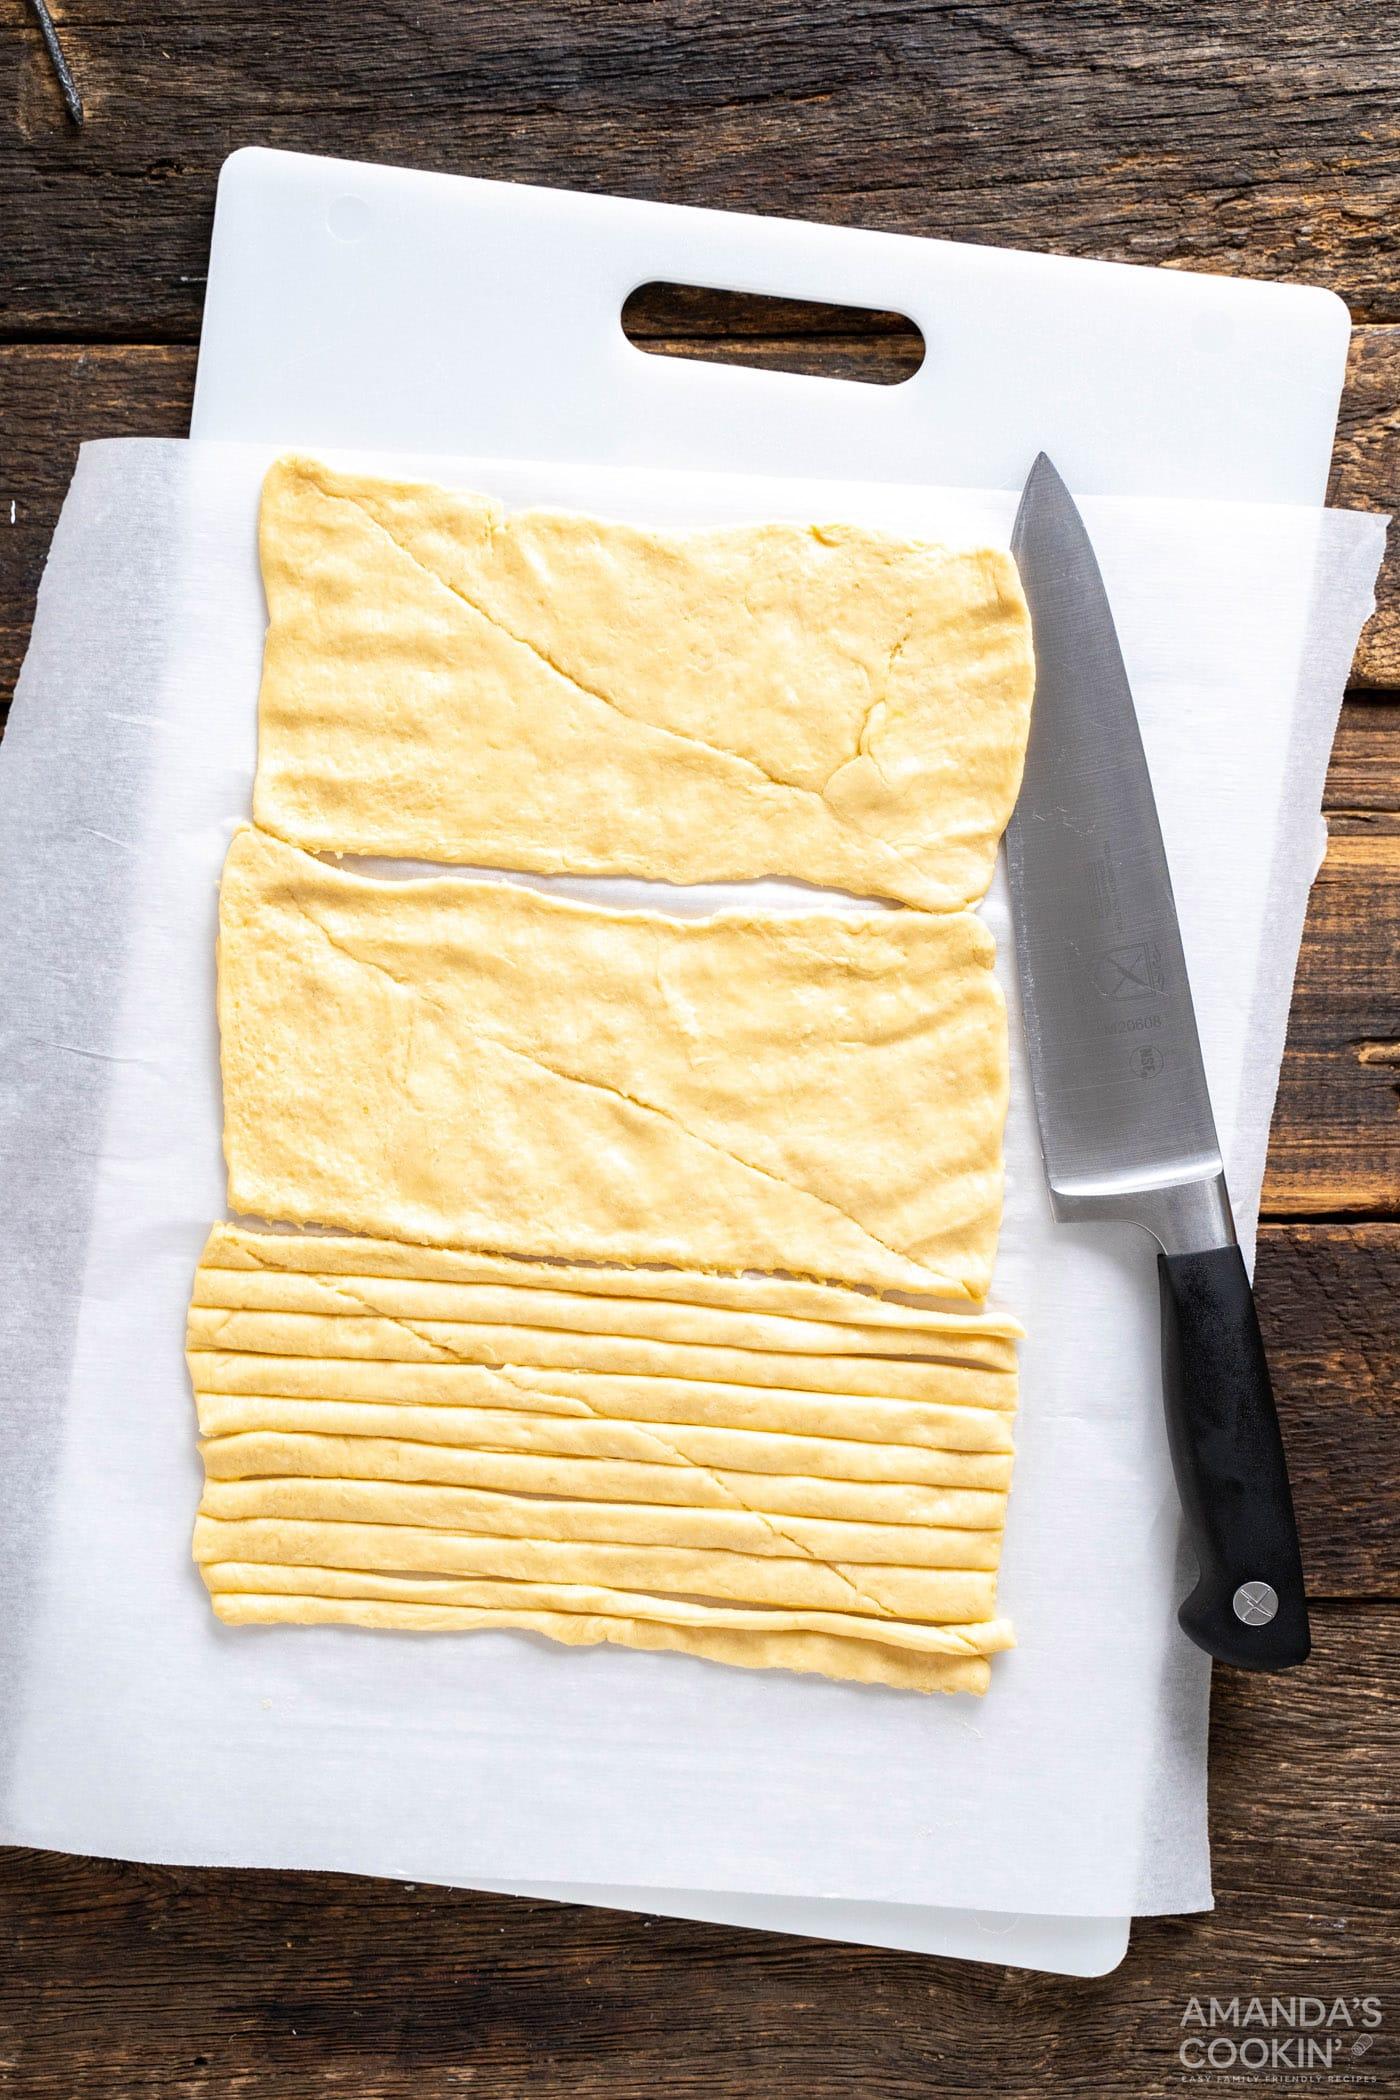 sliced crescent dough on a cutting board